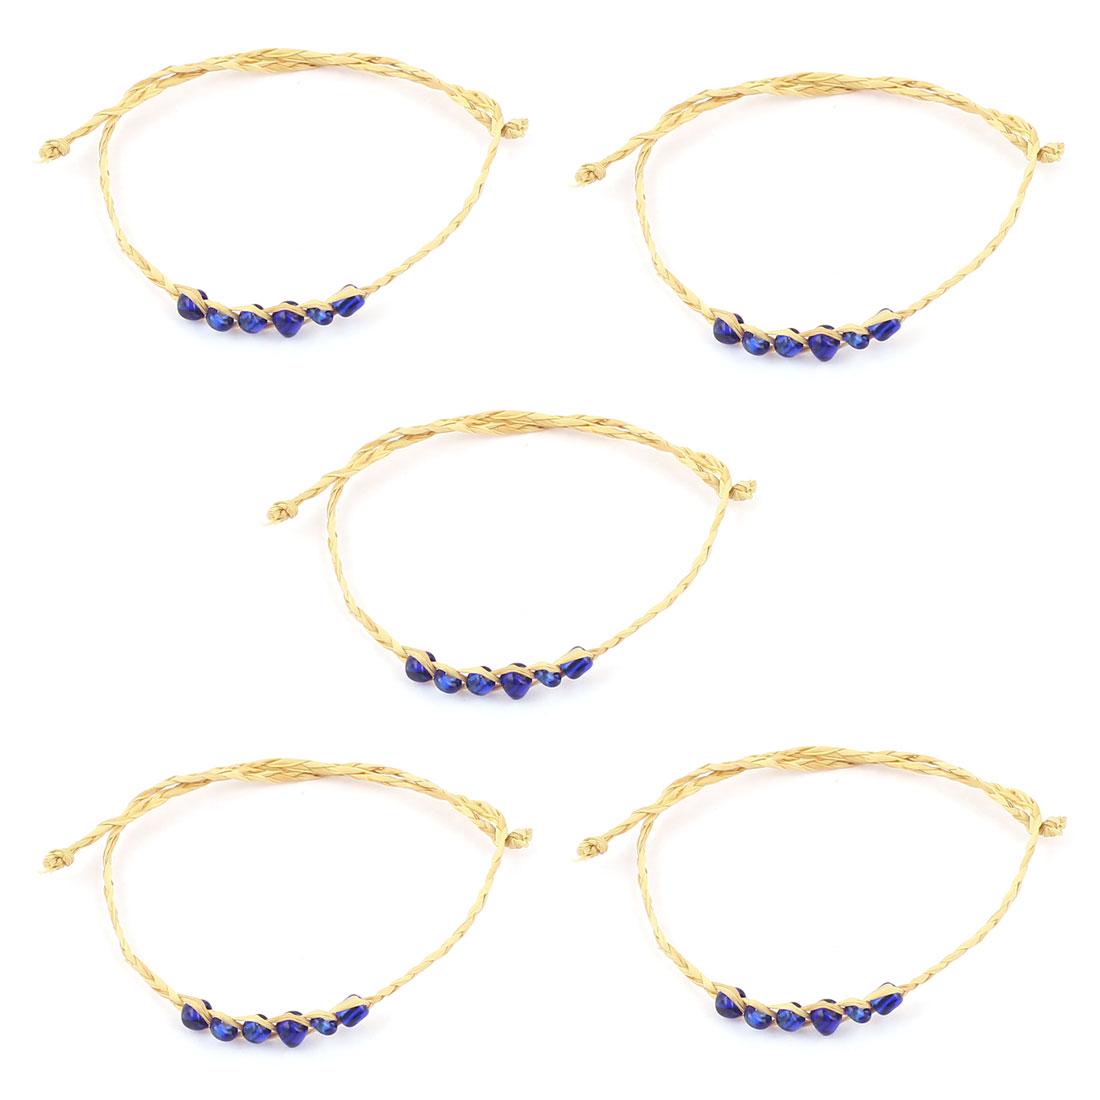 Dark Blue Plastic Beads Decorated Straw Bracelets Bangle 5 PCS